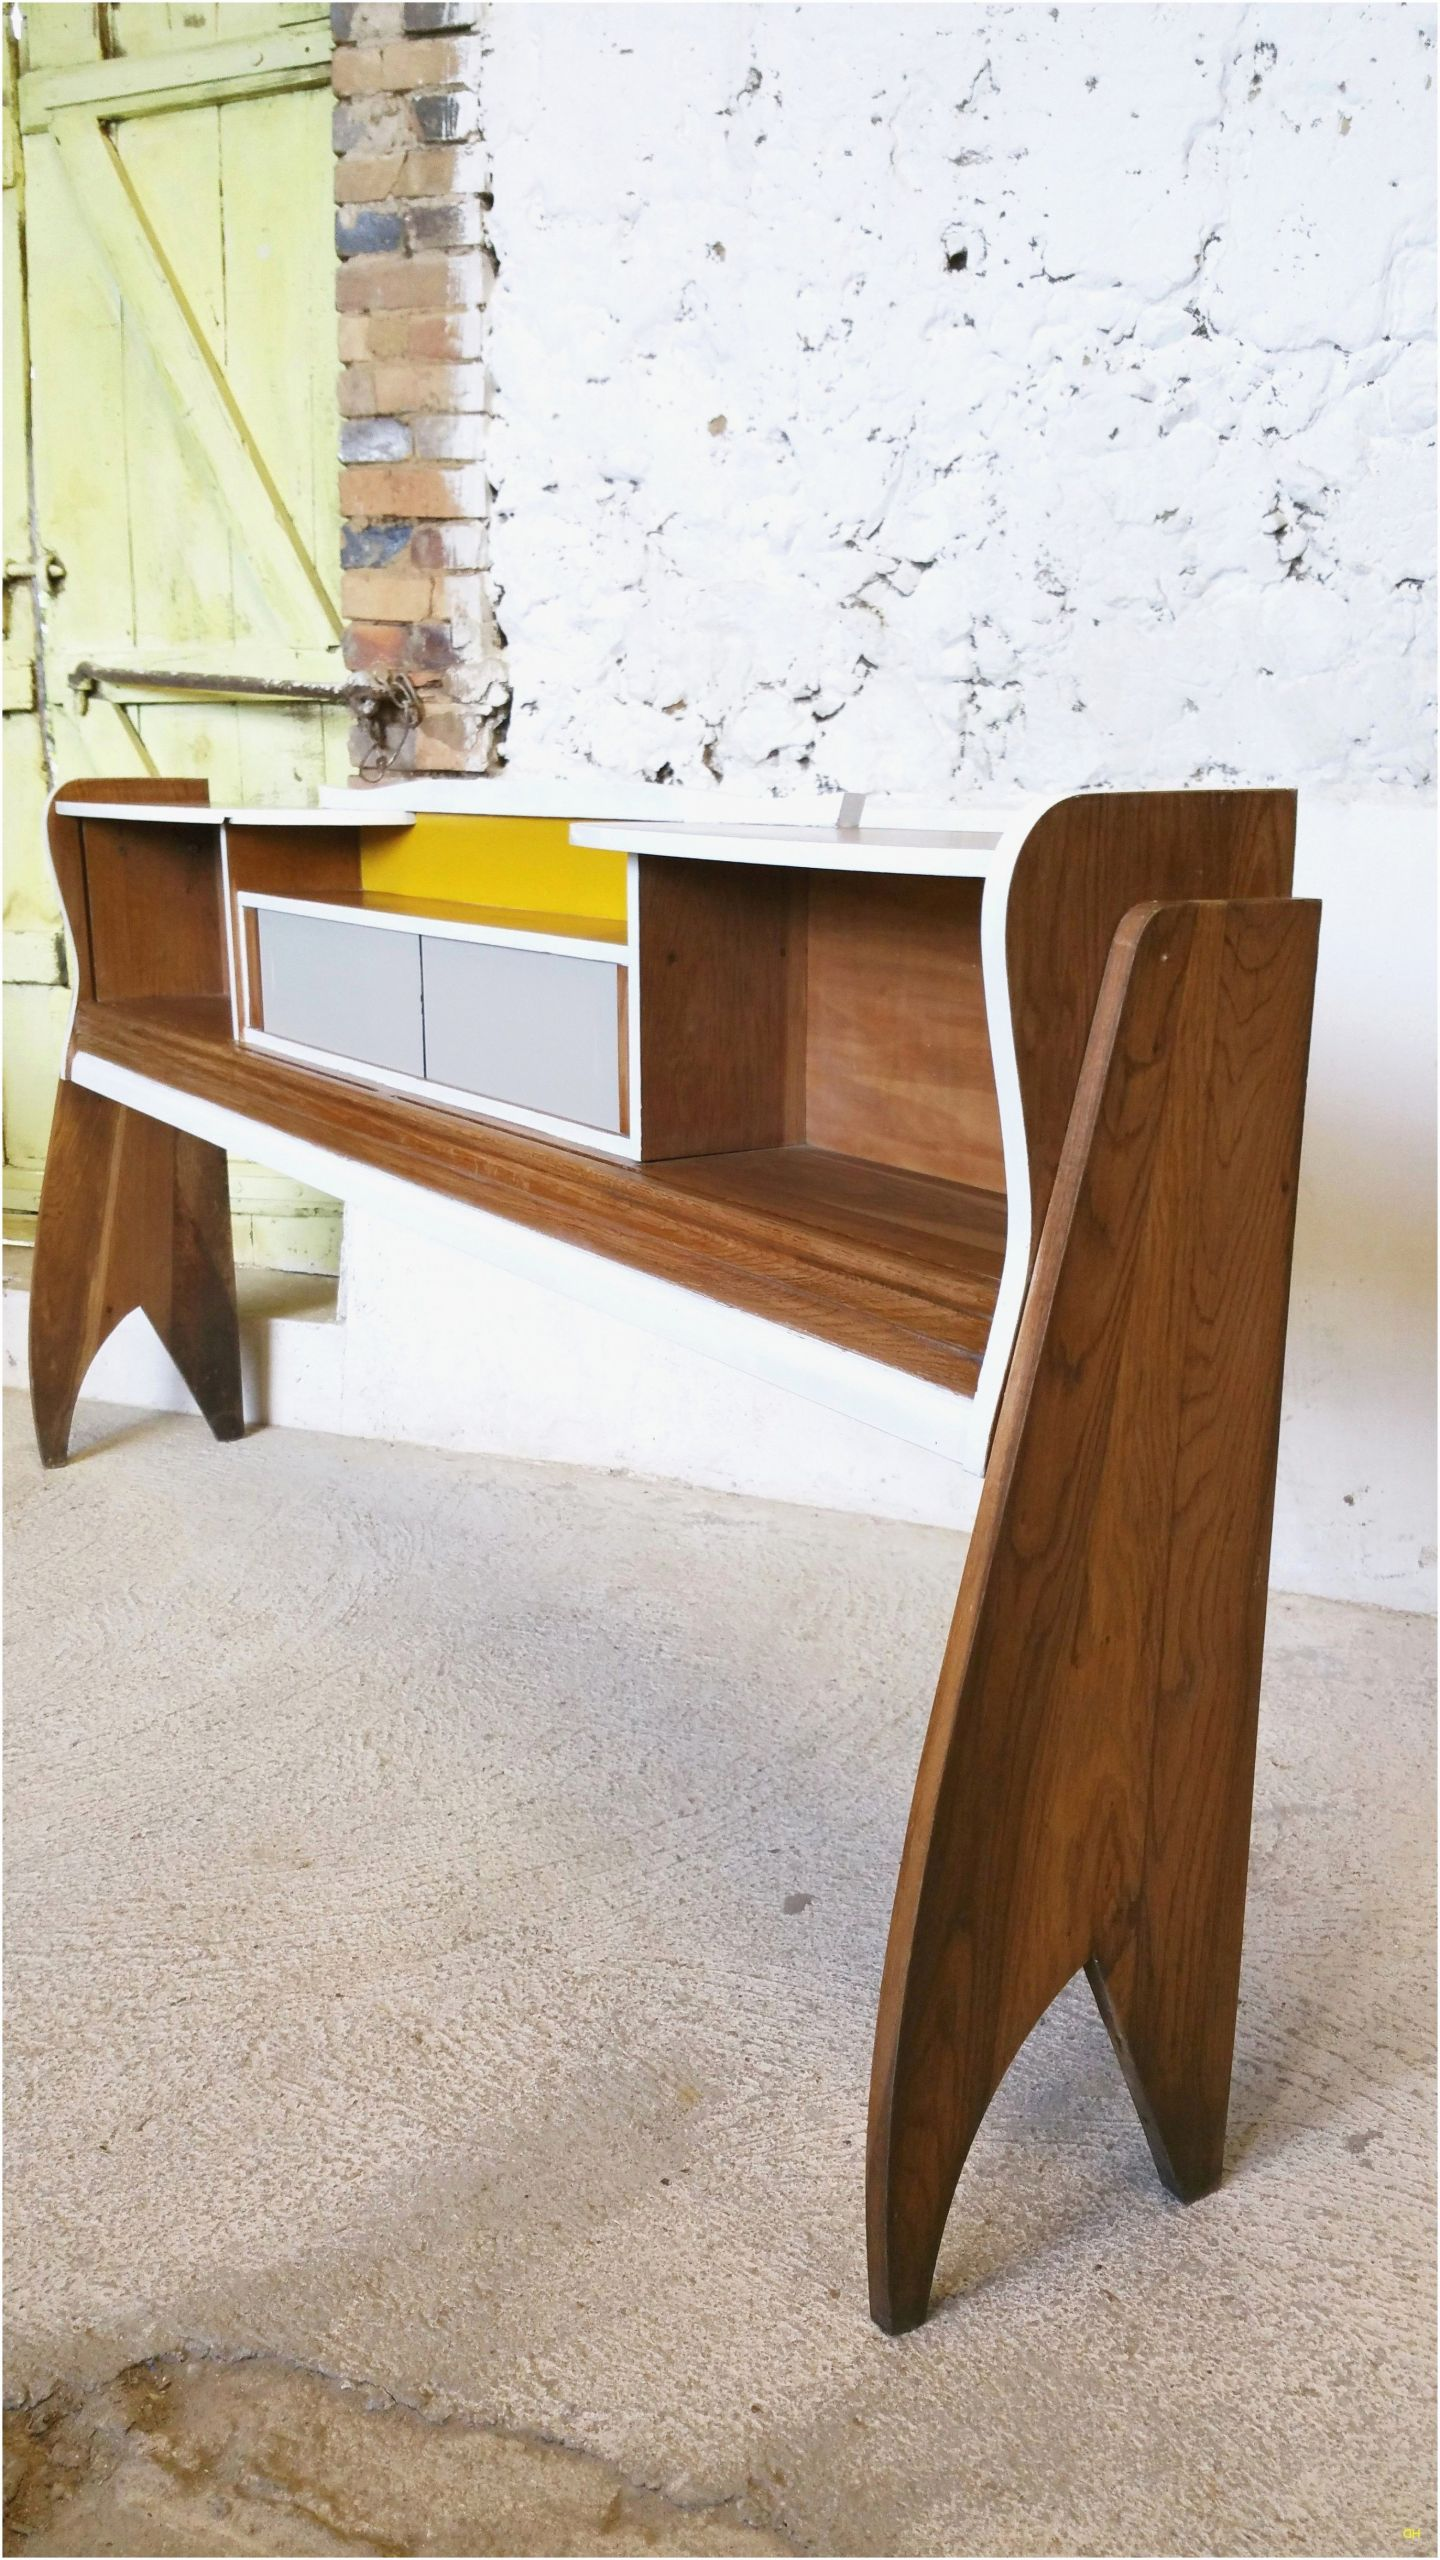 armoire de jardin pas cher beau armoire lit bureau conforama meuble bureau unique armoire tiroir 0d of armoire de jardin pas cher